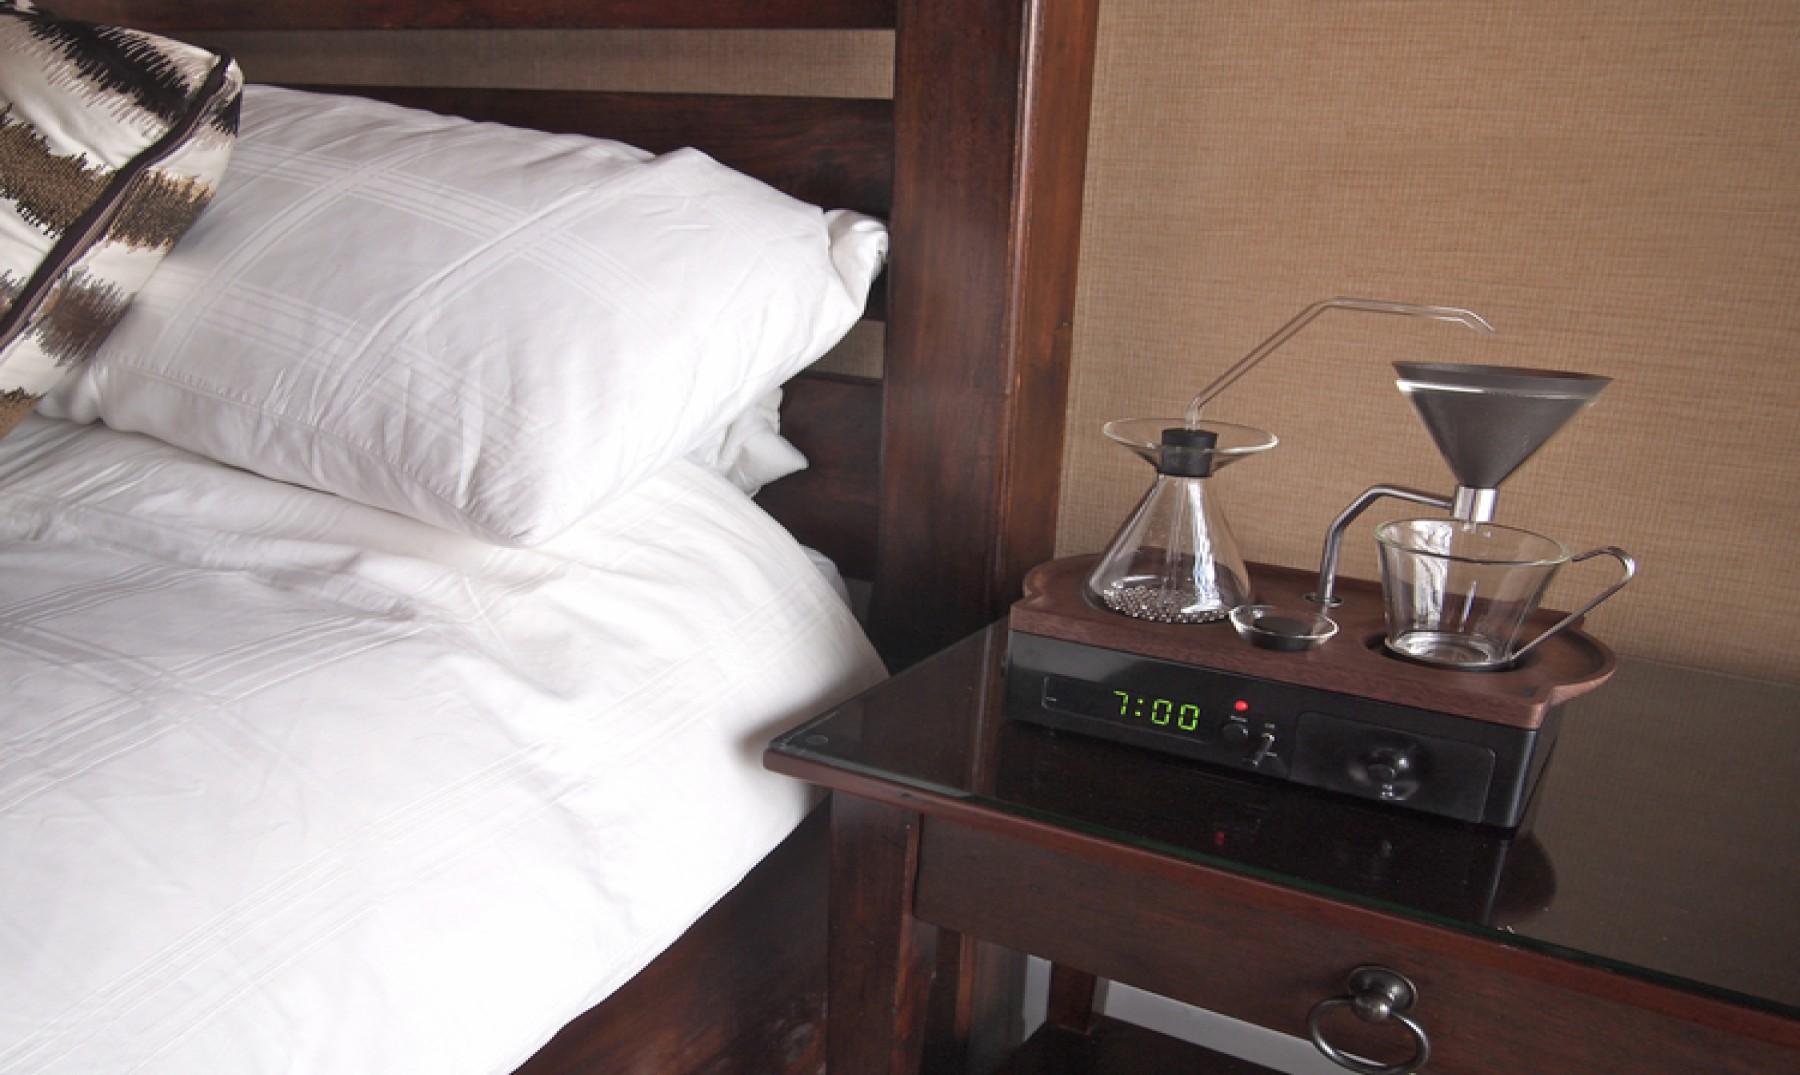 Fuera alarmas: despiértate con aroma de café